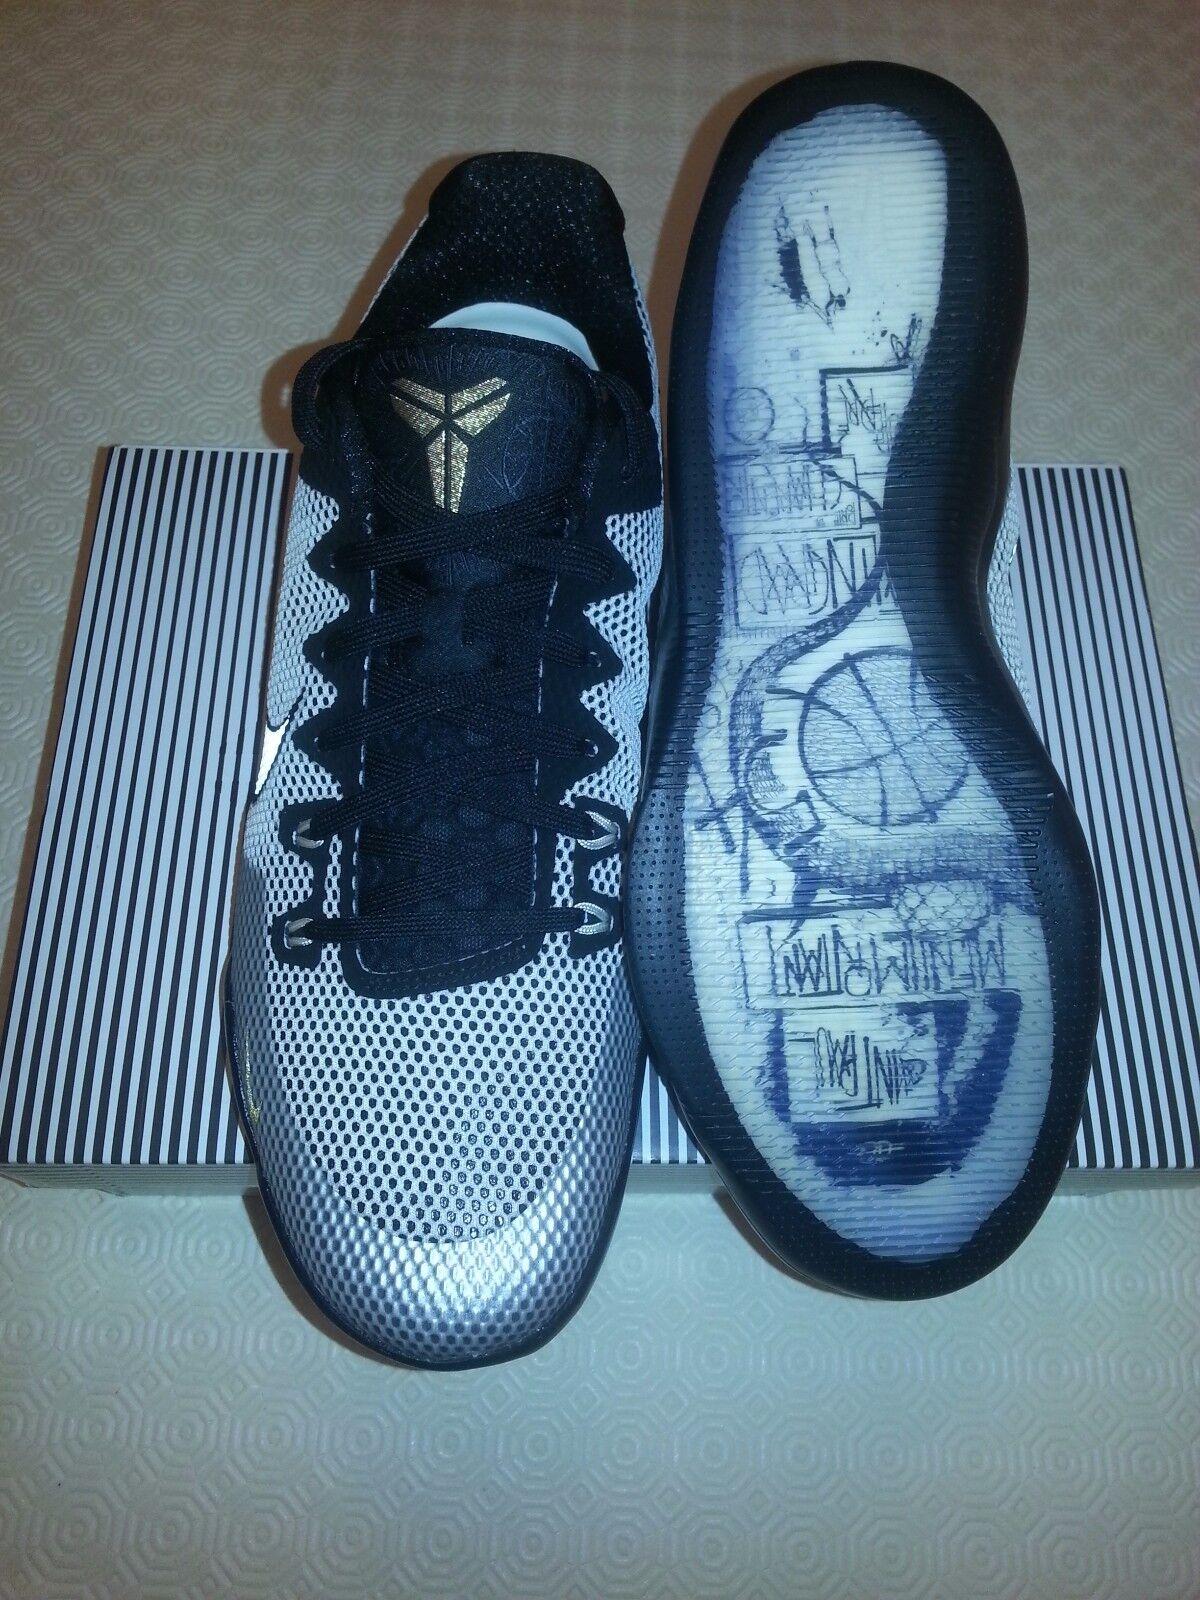 Nike Kobe 11 XI Q54 Quai 54 LMTD Limited 869600-010 Europe Exclusive RARE Elite